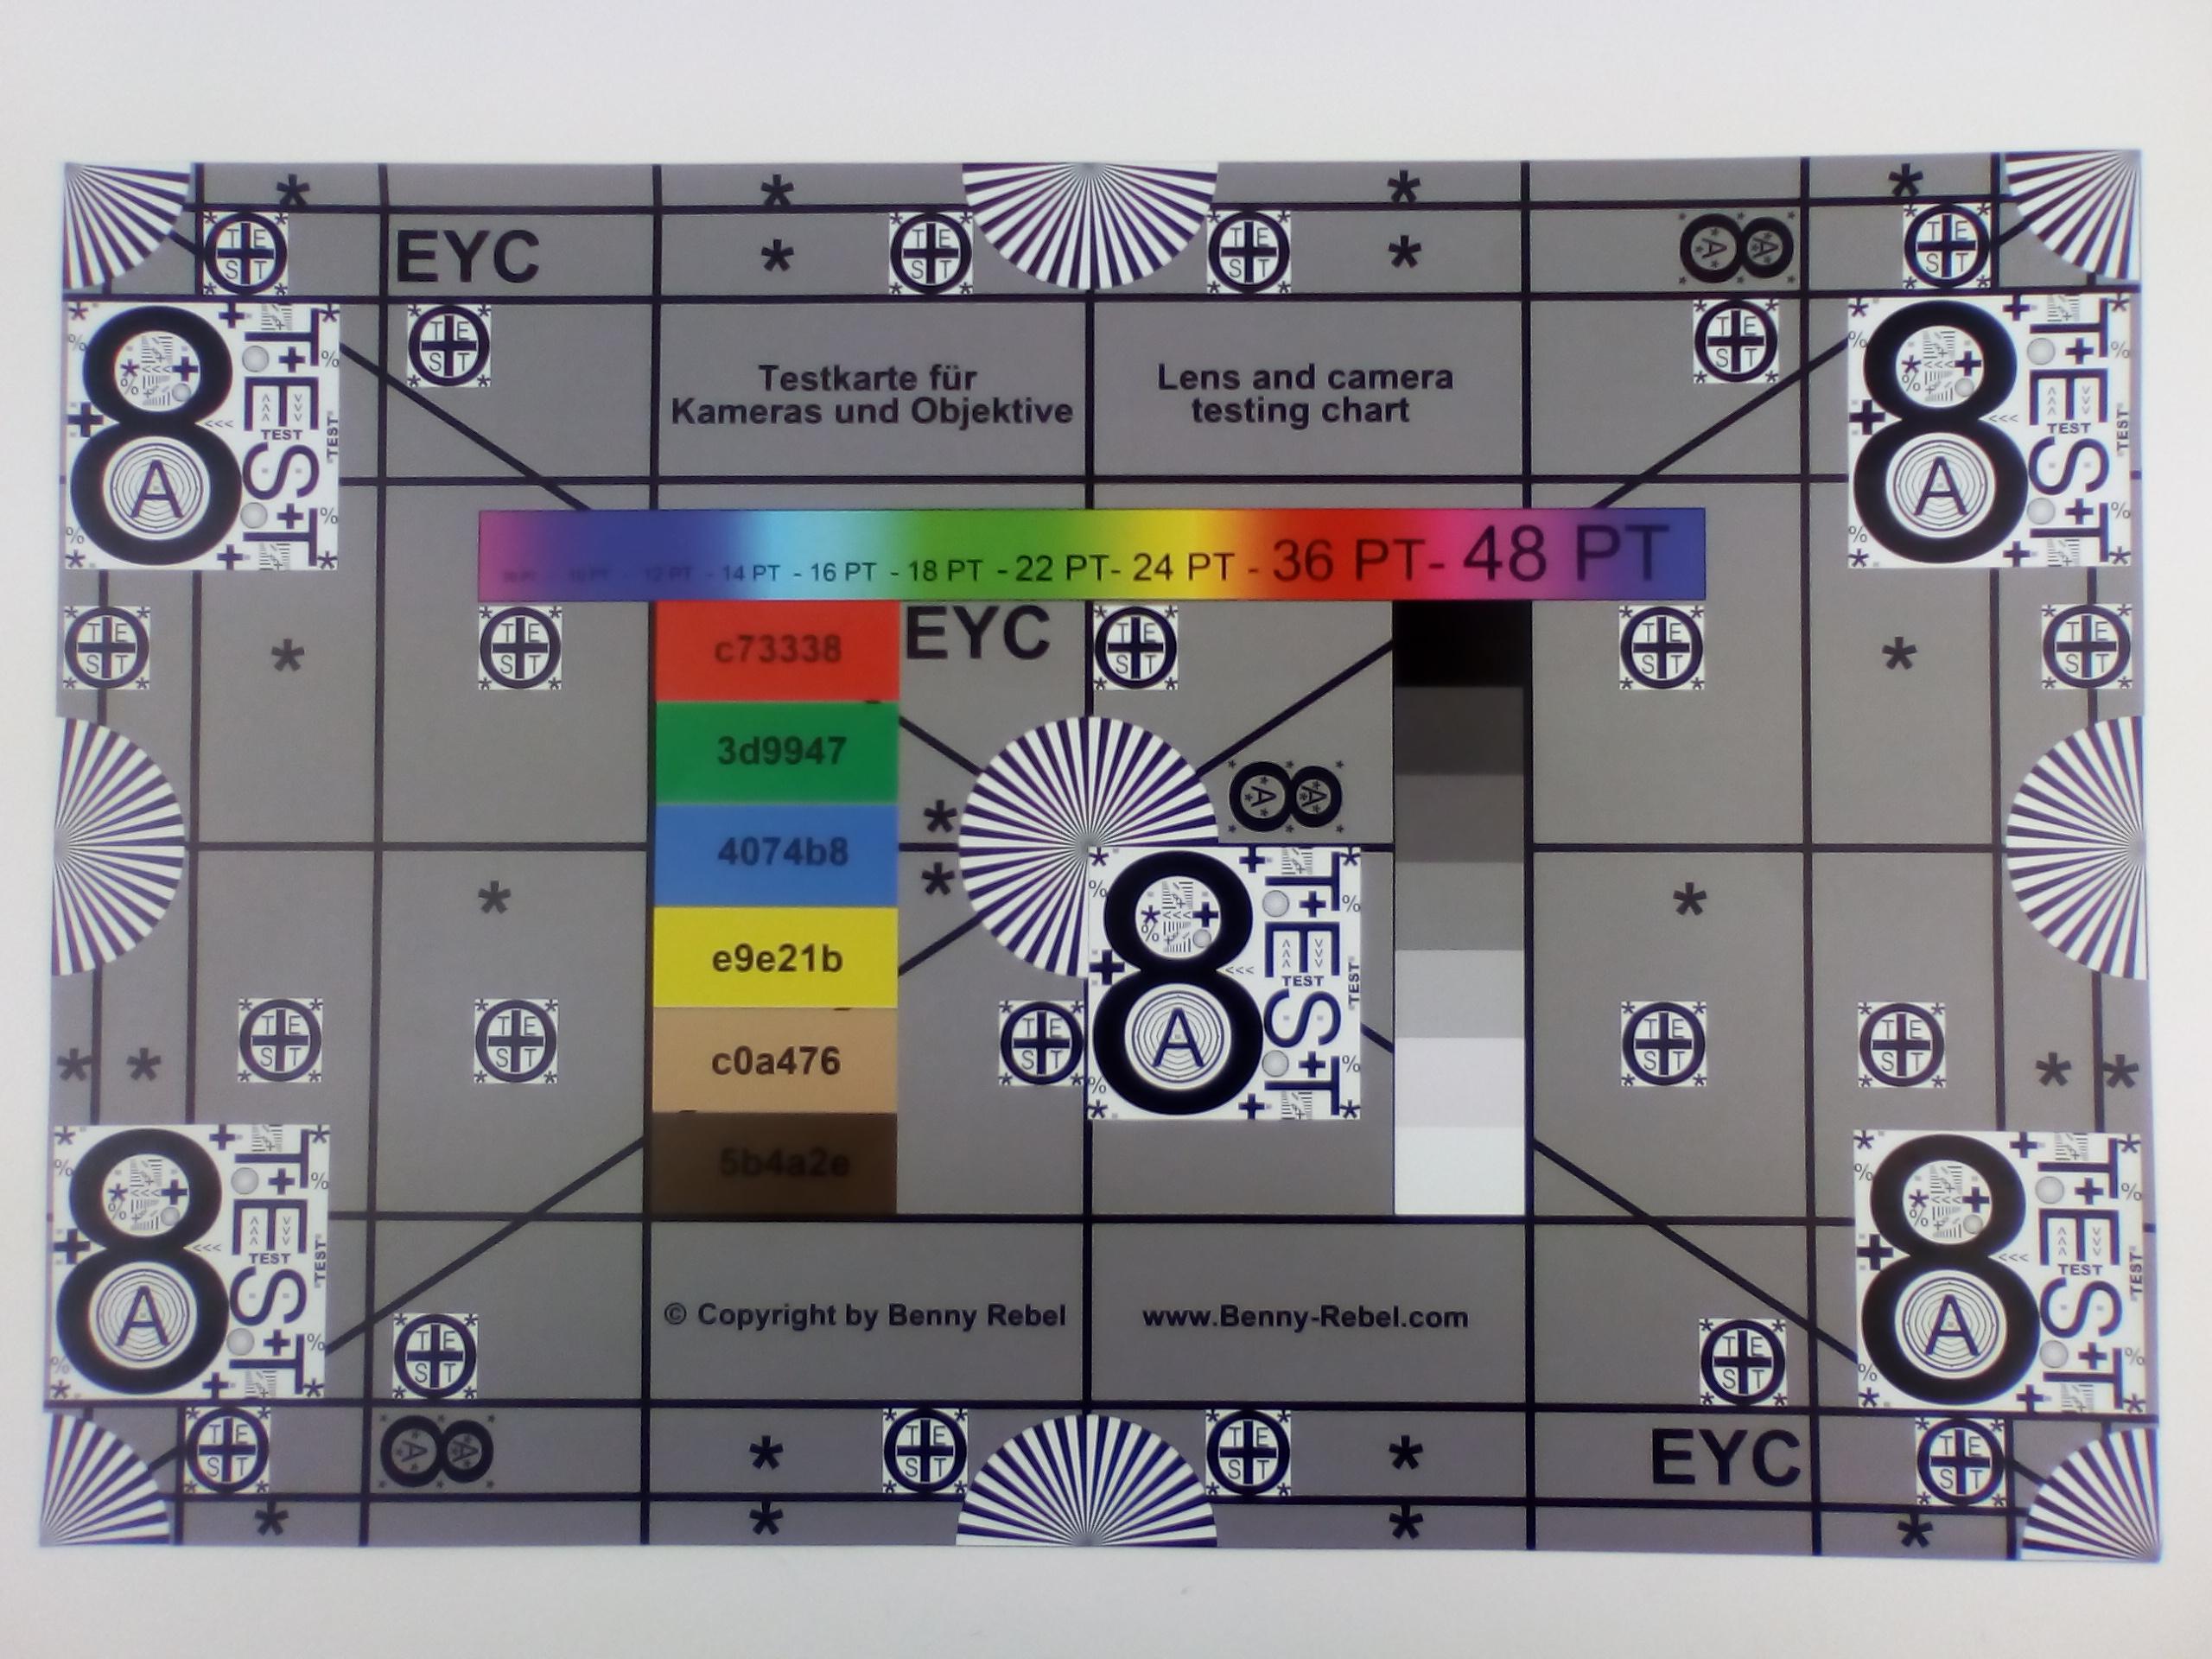 измеритеРьная табРица основная камера